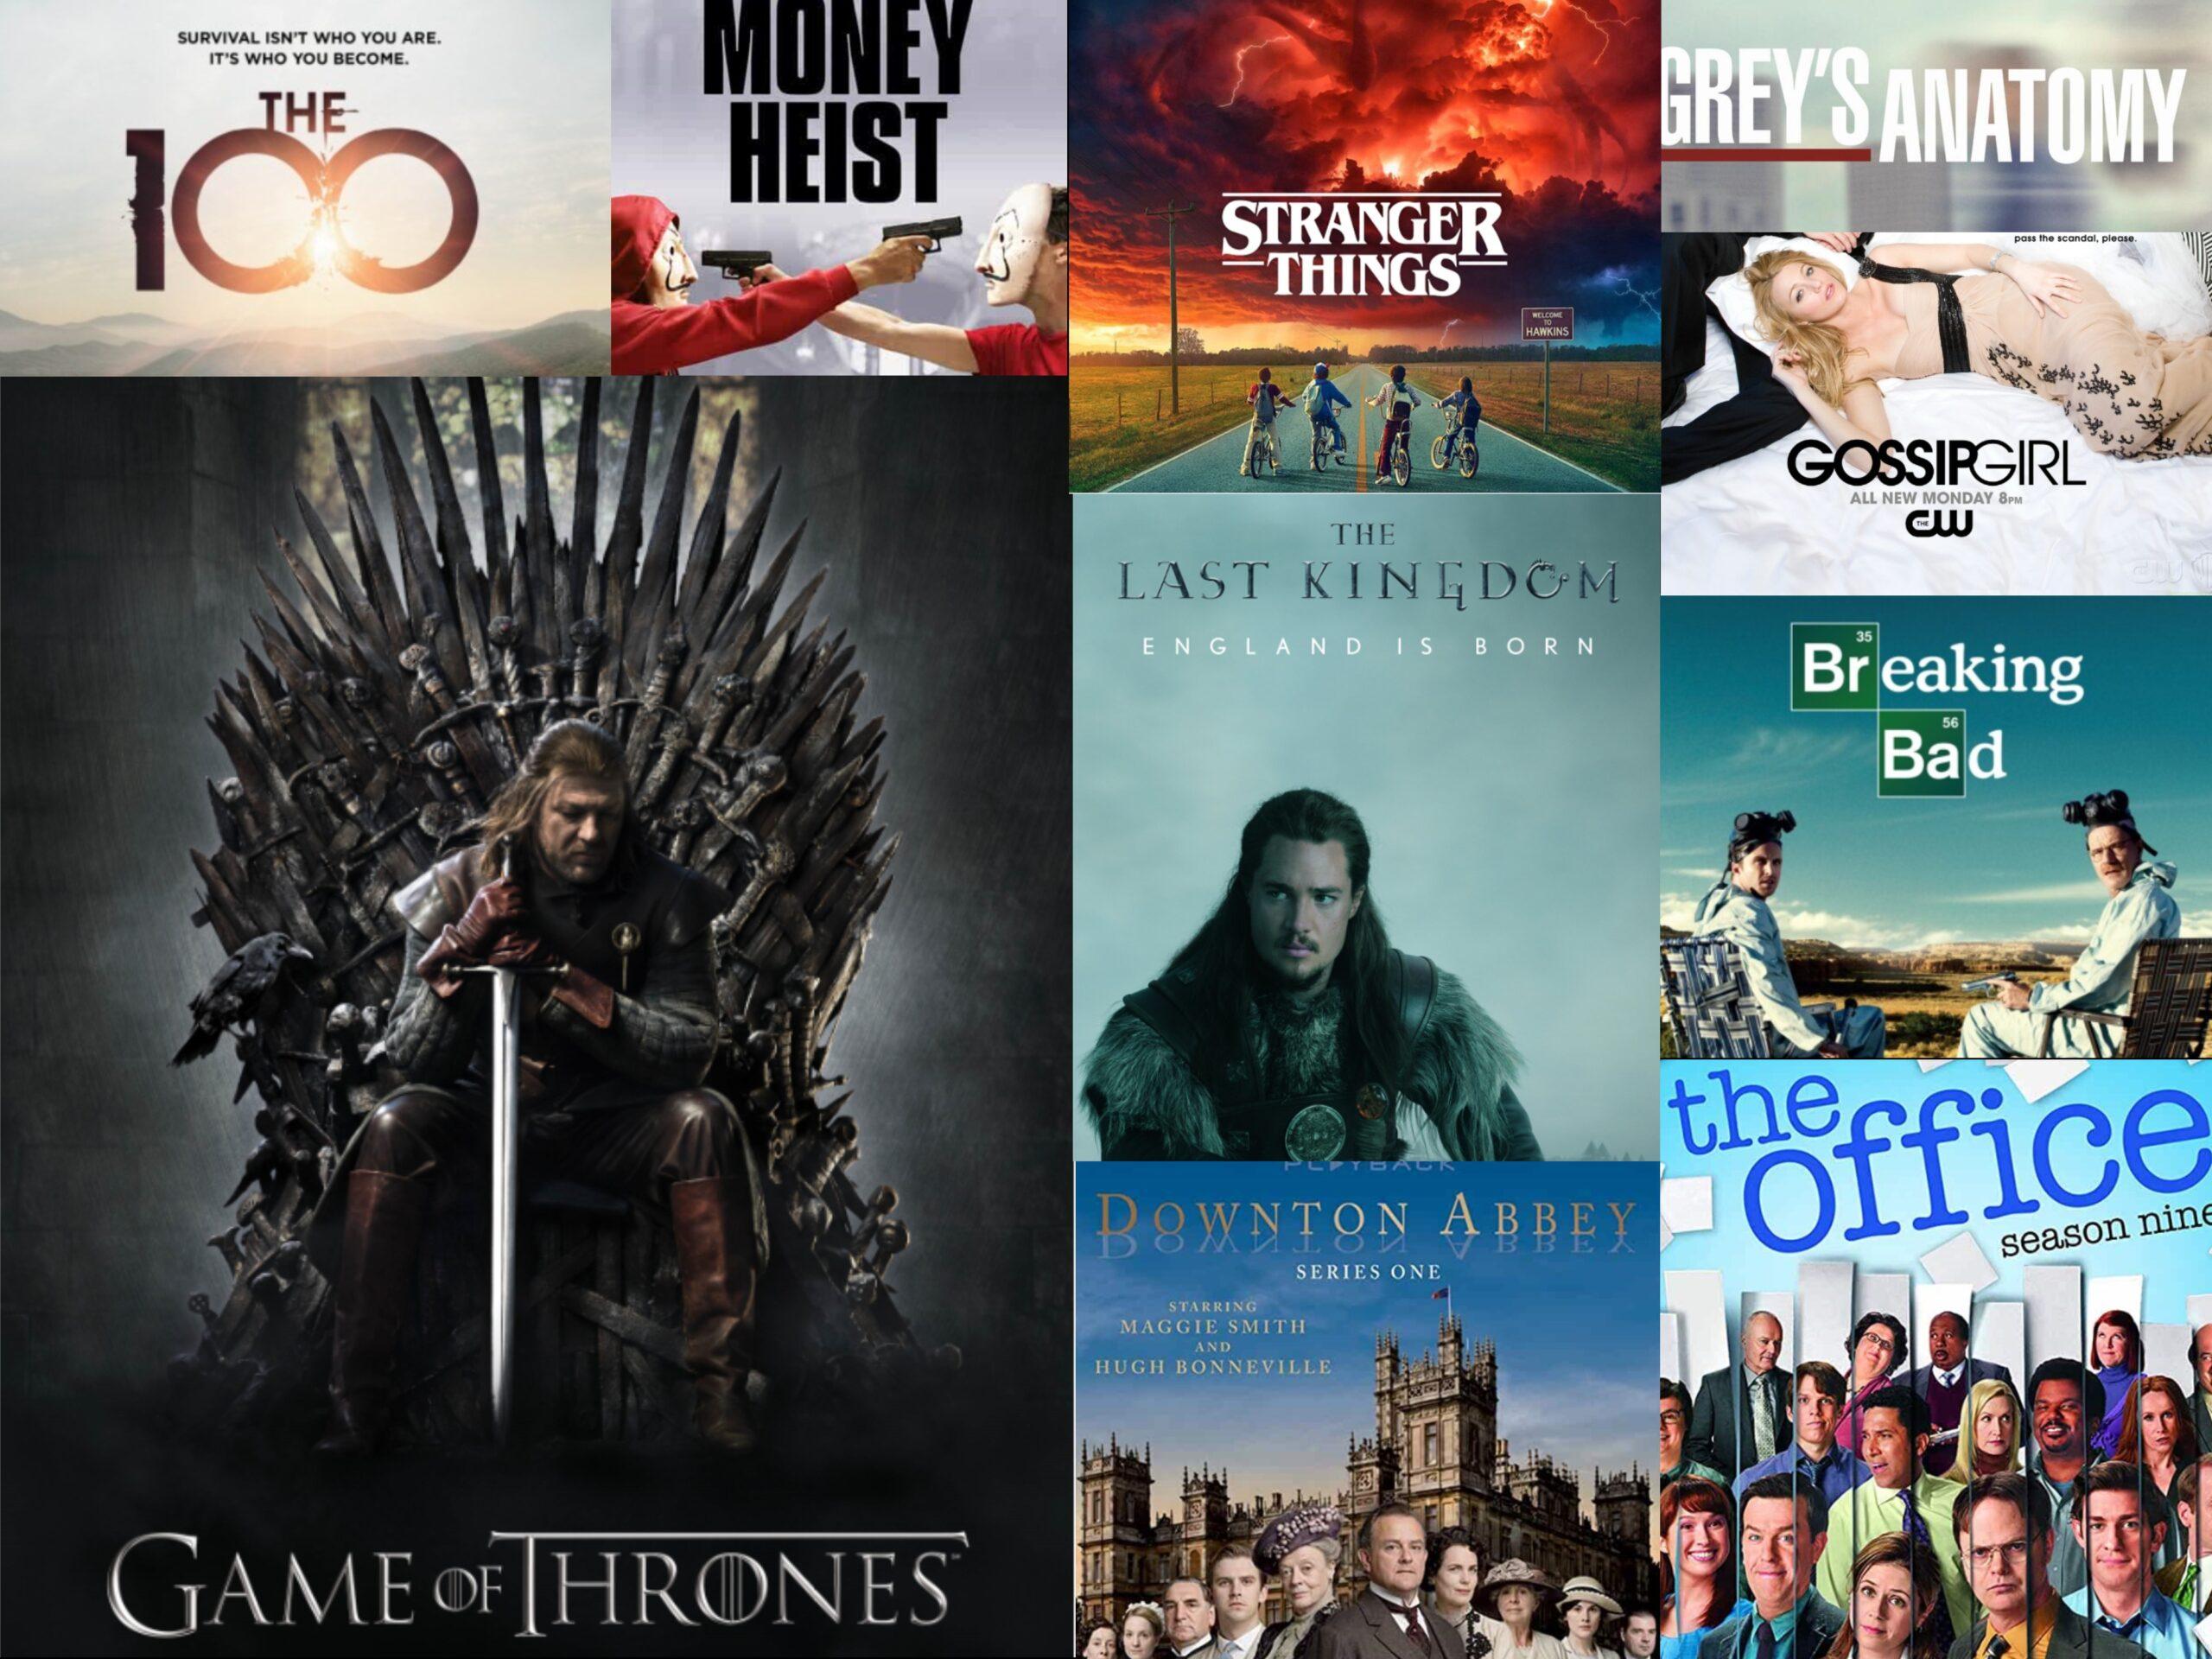 Top 10 Shows to Binge Watch